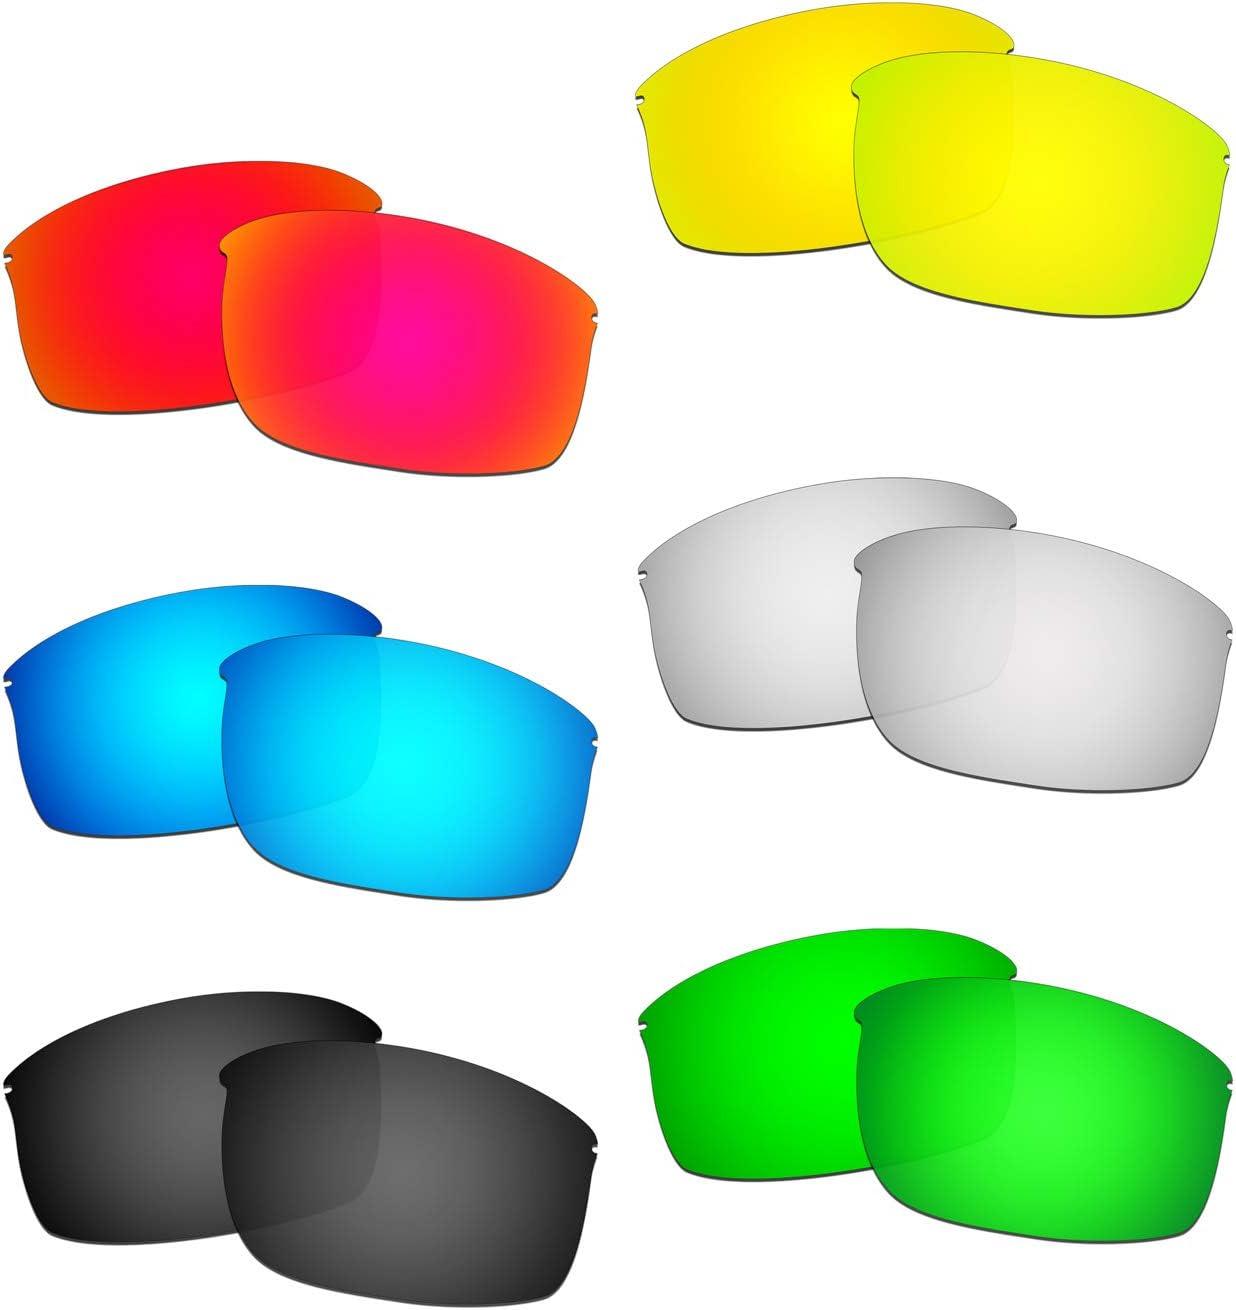 HKUCO する交換用レンズ Oakley Wiretap New 赤/ブルー/ブラック/24 Kゴールド/チタン/グリーン サングラス 赤/ブルー/ブラック/24 Kゴールド/チタン/グリーン